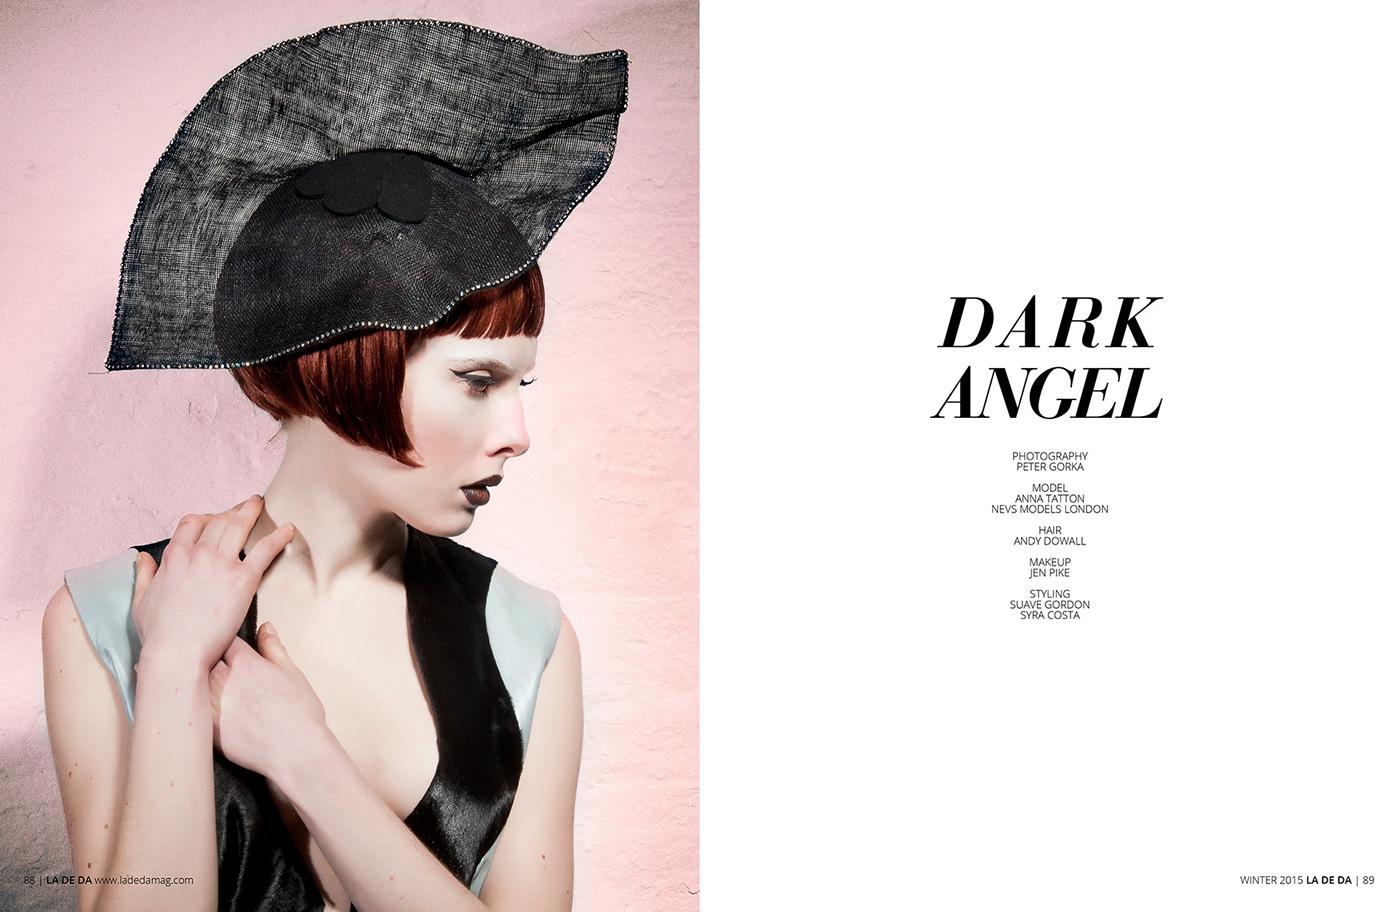 Fashion  Photography  editorial magazine publication model hair style Fotografia moda